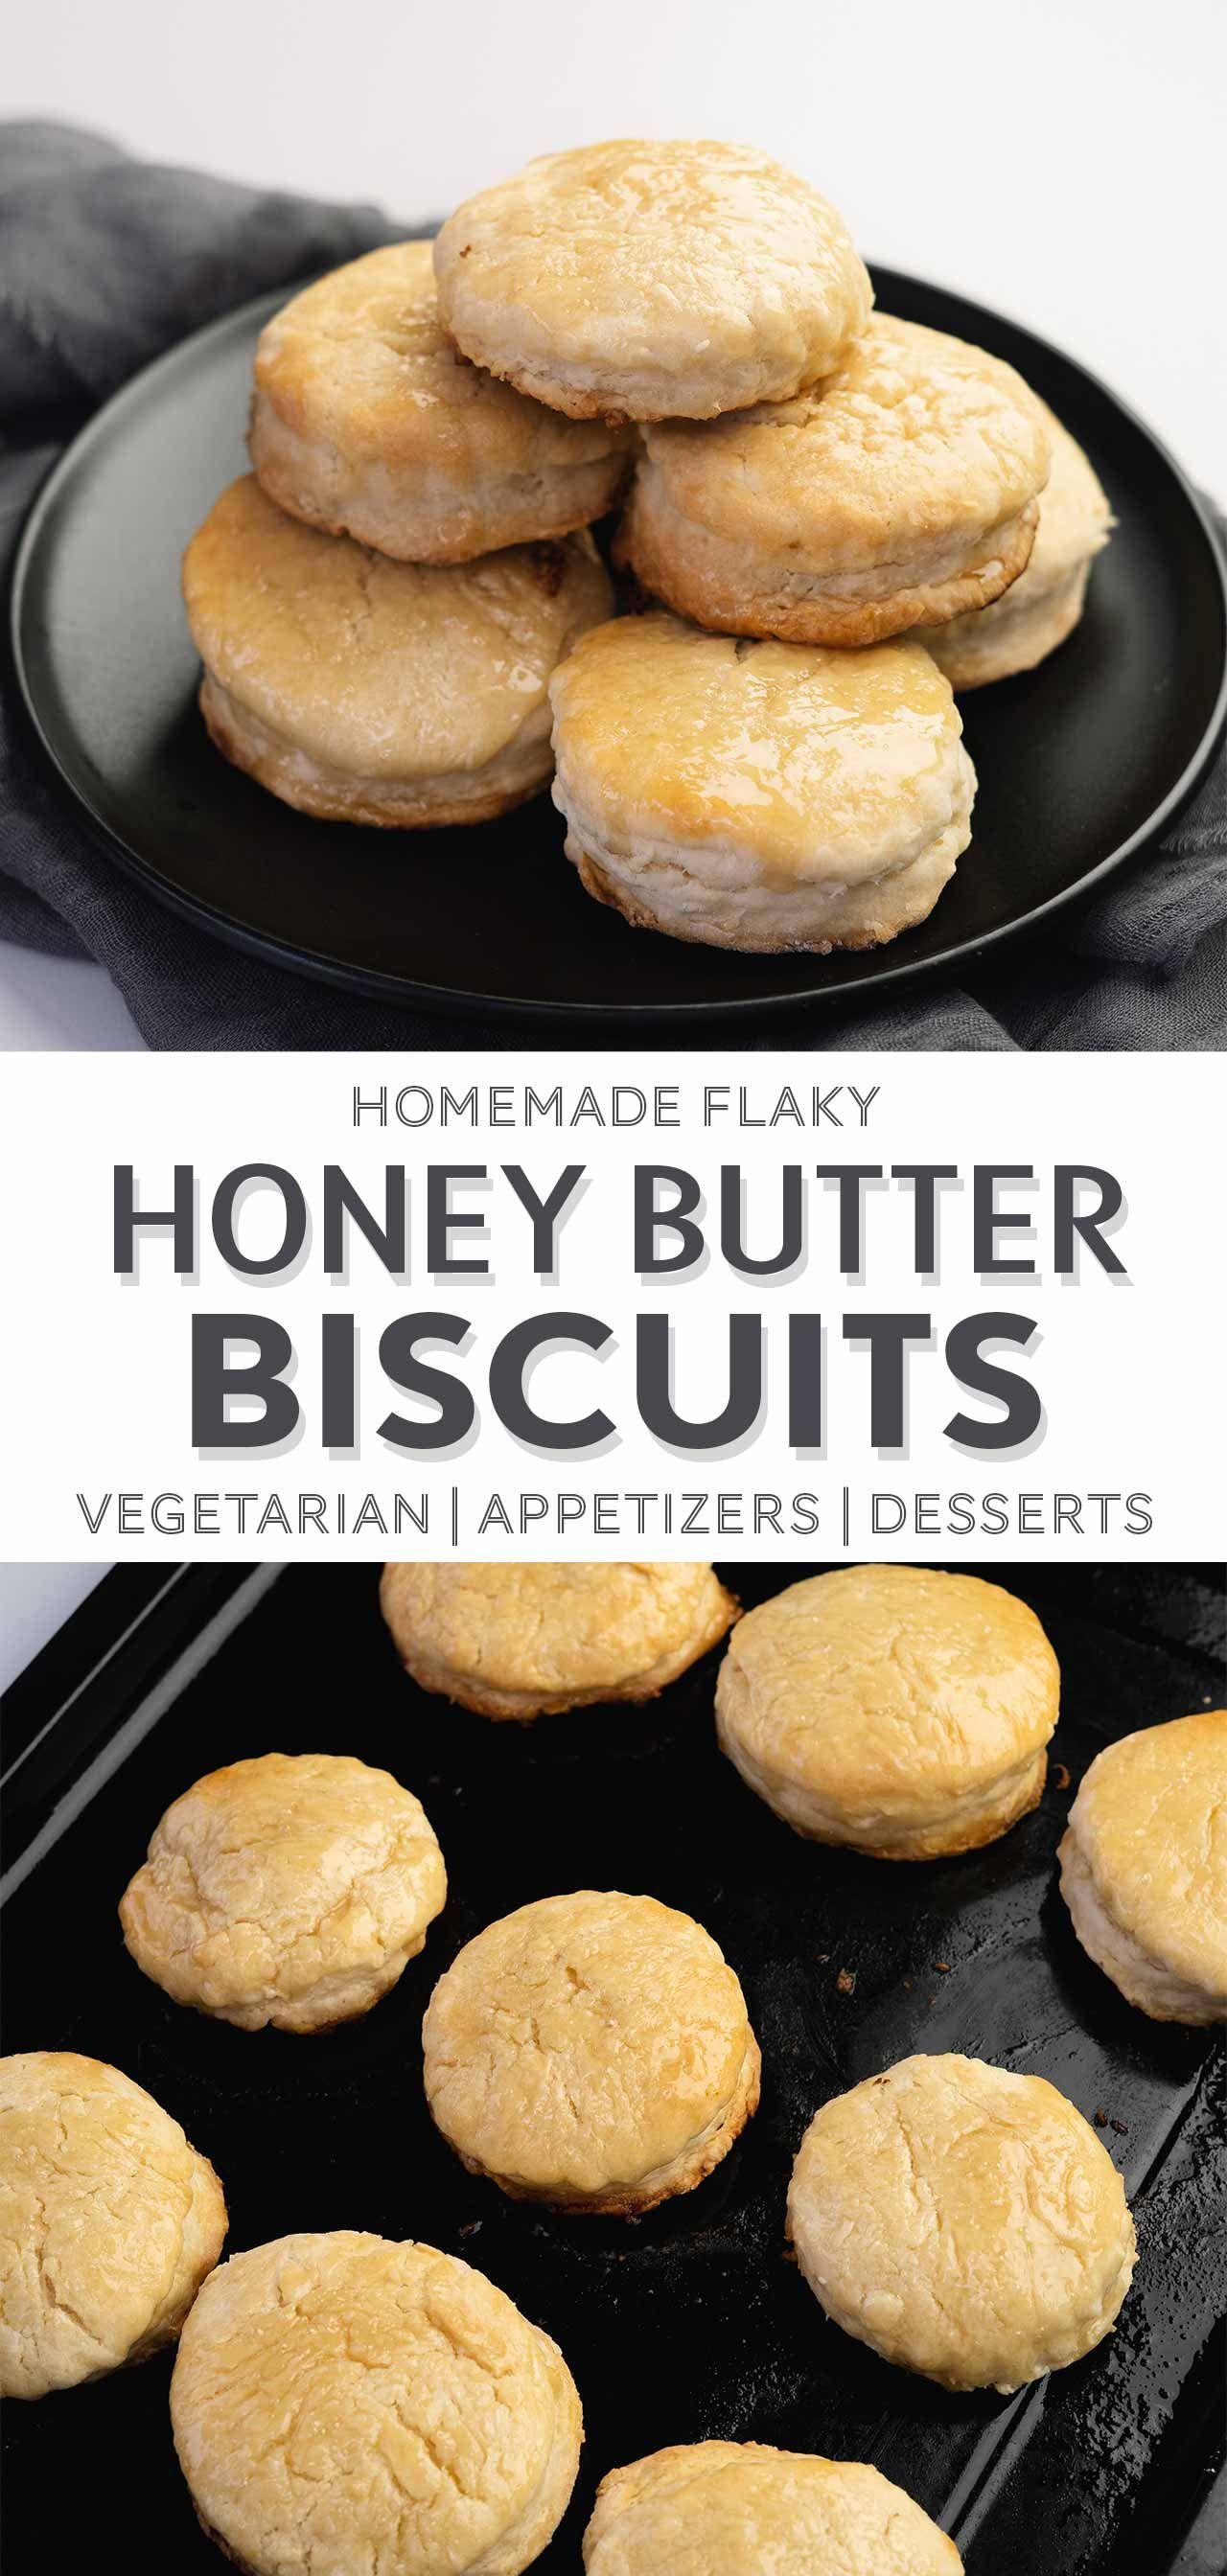 Homemade Honey Butter Biscuits Recipe Honey Butter Biscuits Butter Biscuits Recipe Honey Recipes